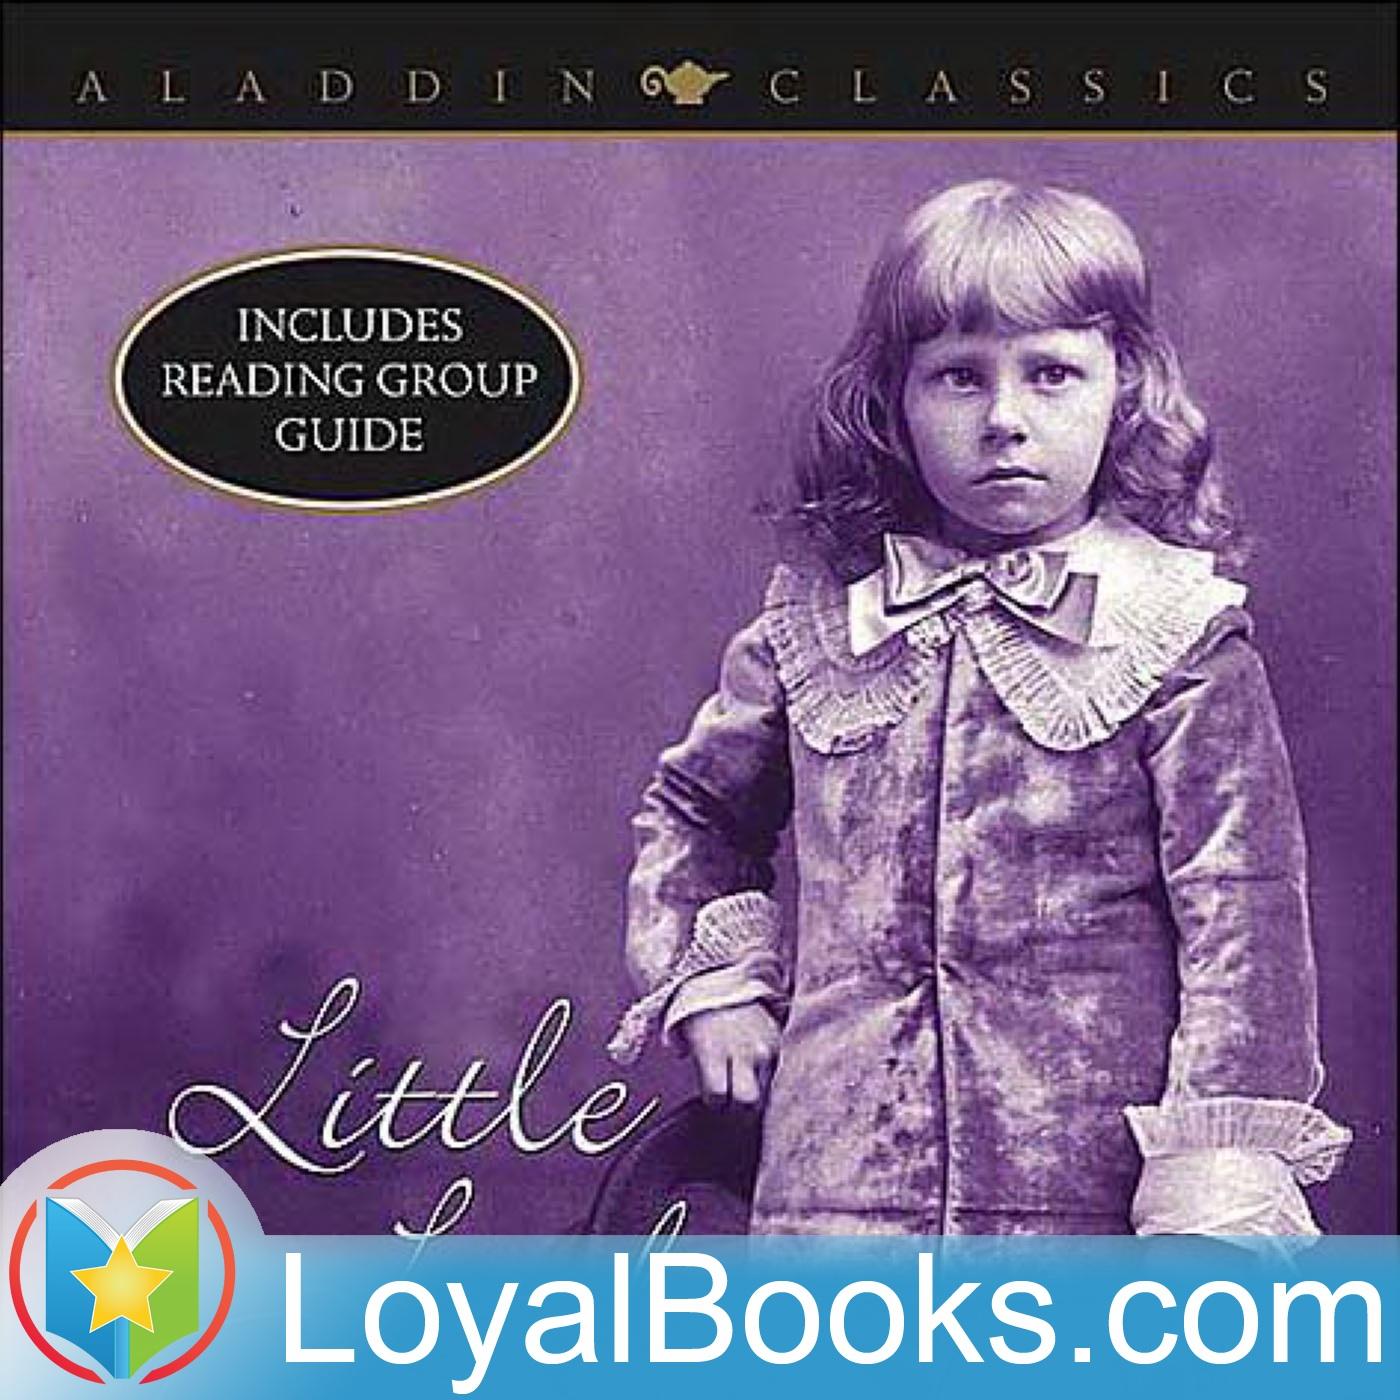 <![CDATA[Little Lord Fauntleroy by Frances Hodgson Burnett]]>